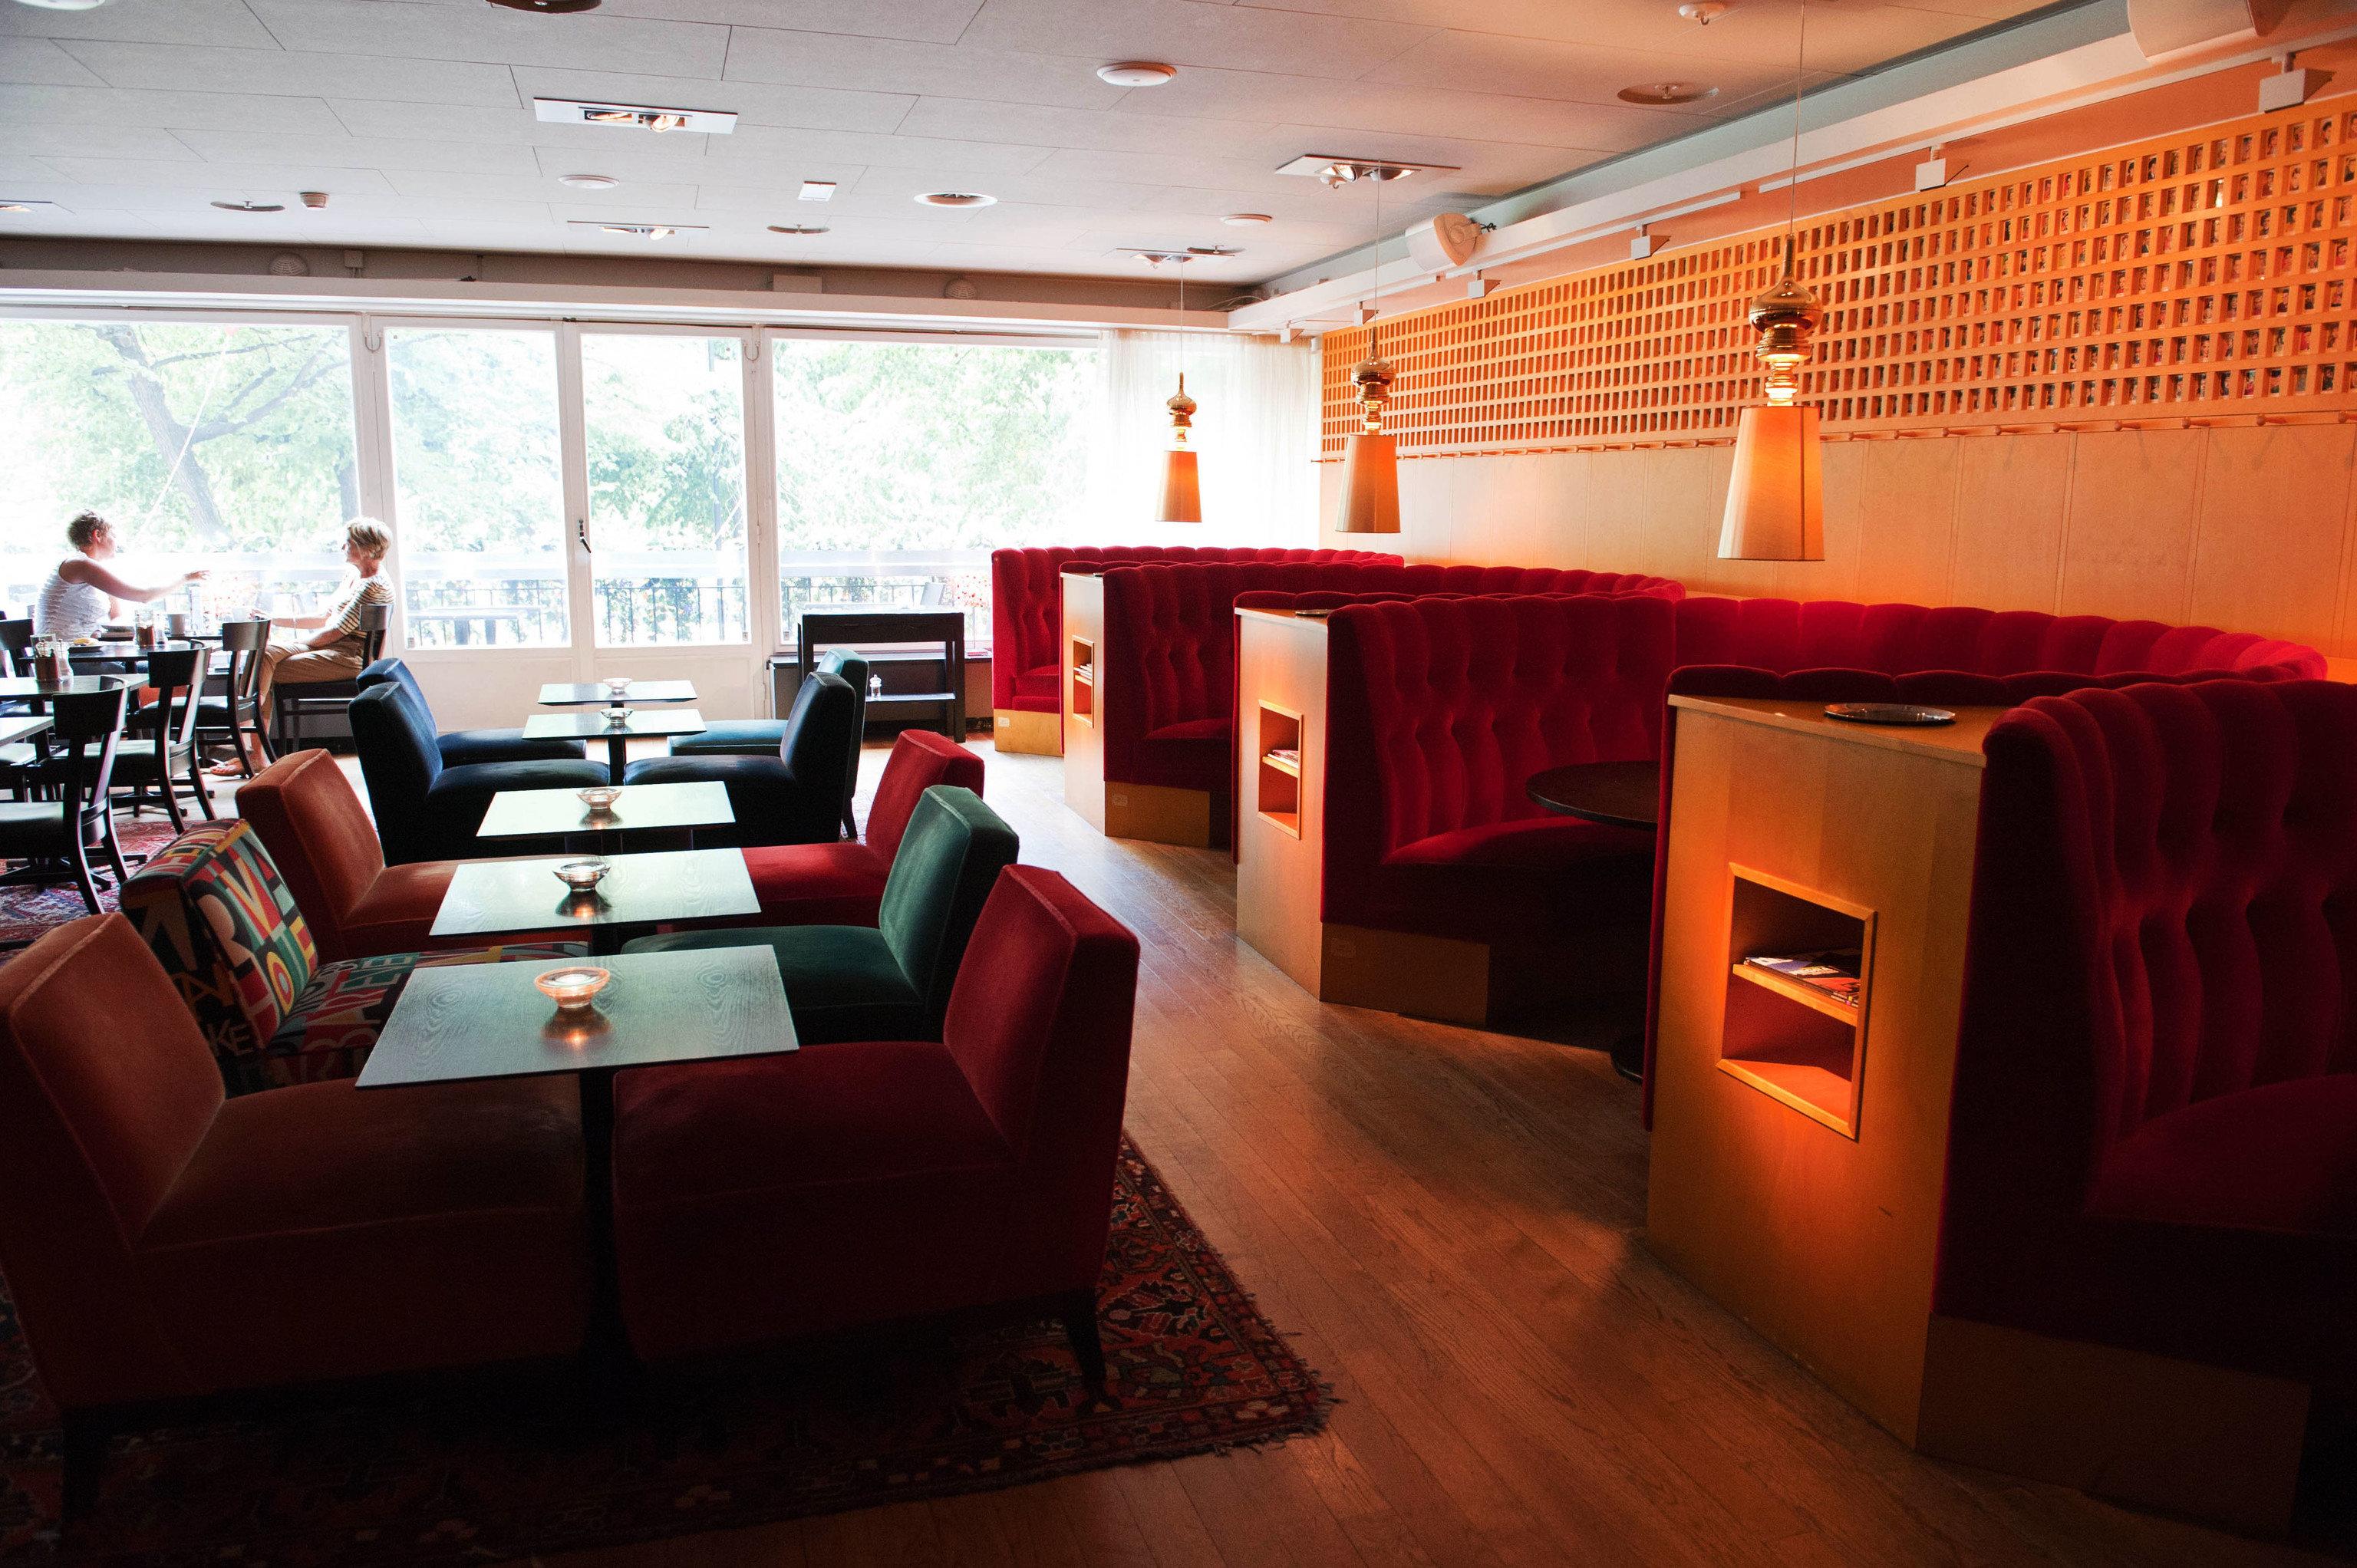 sofa Lobby restaurant living room conference hall